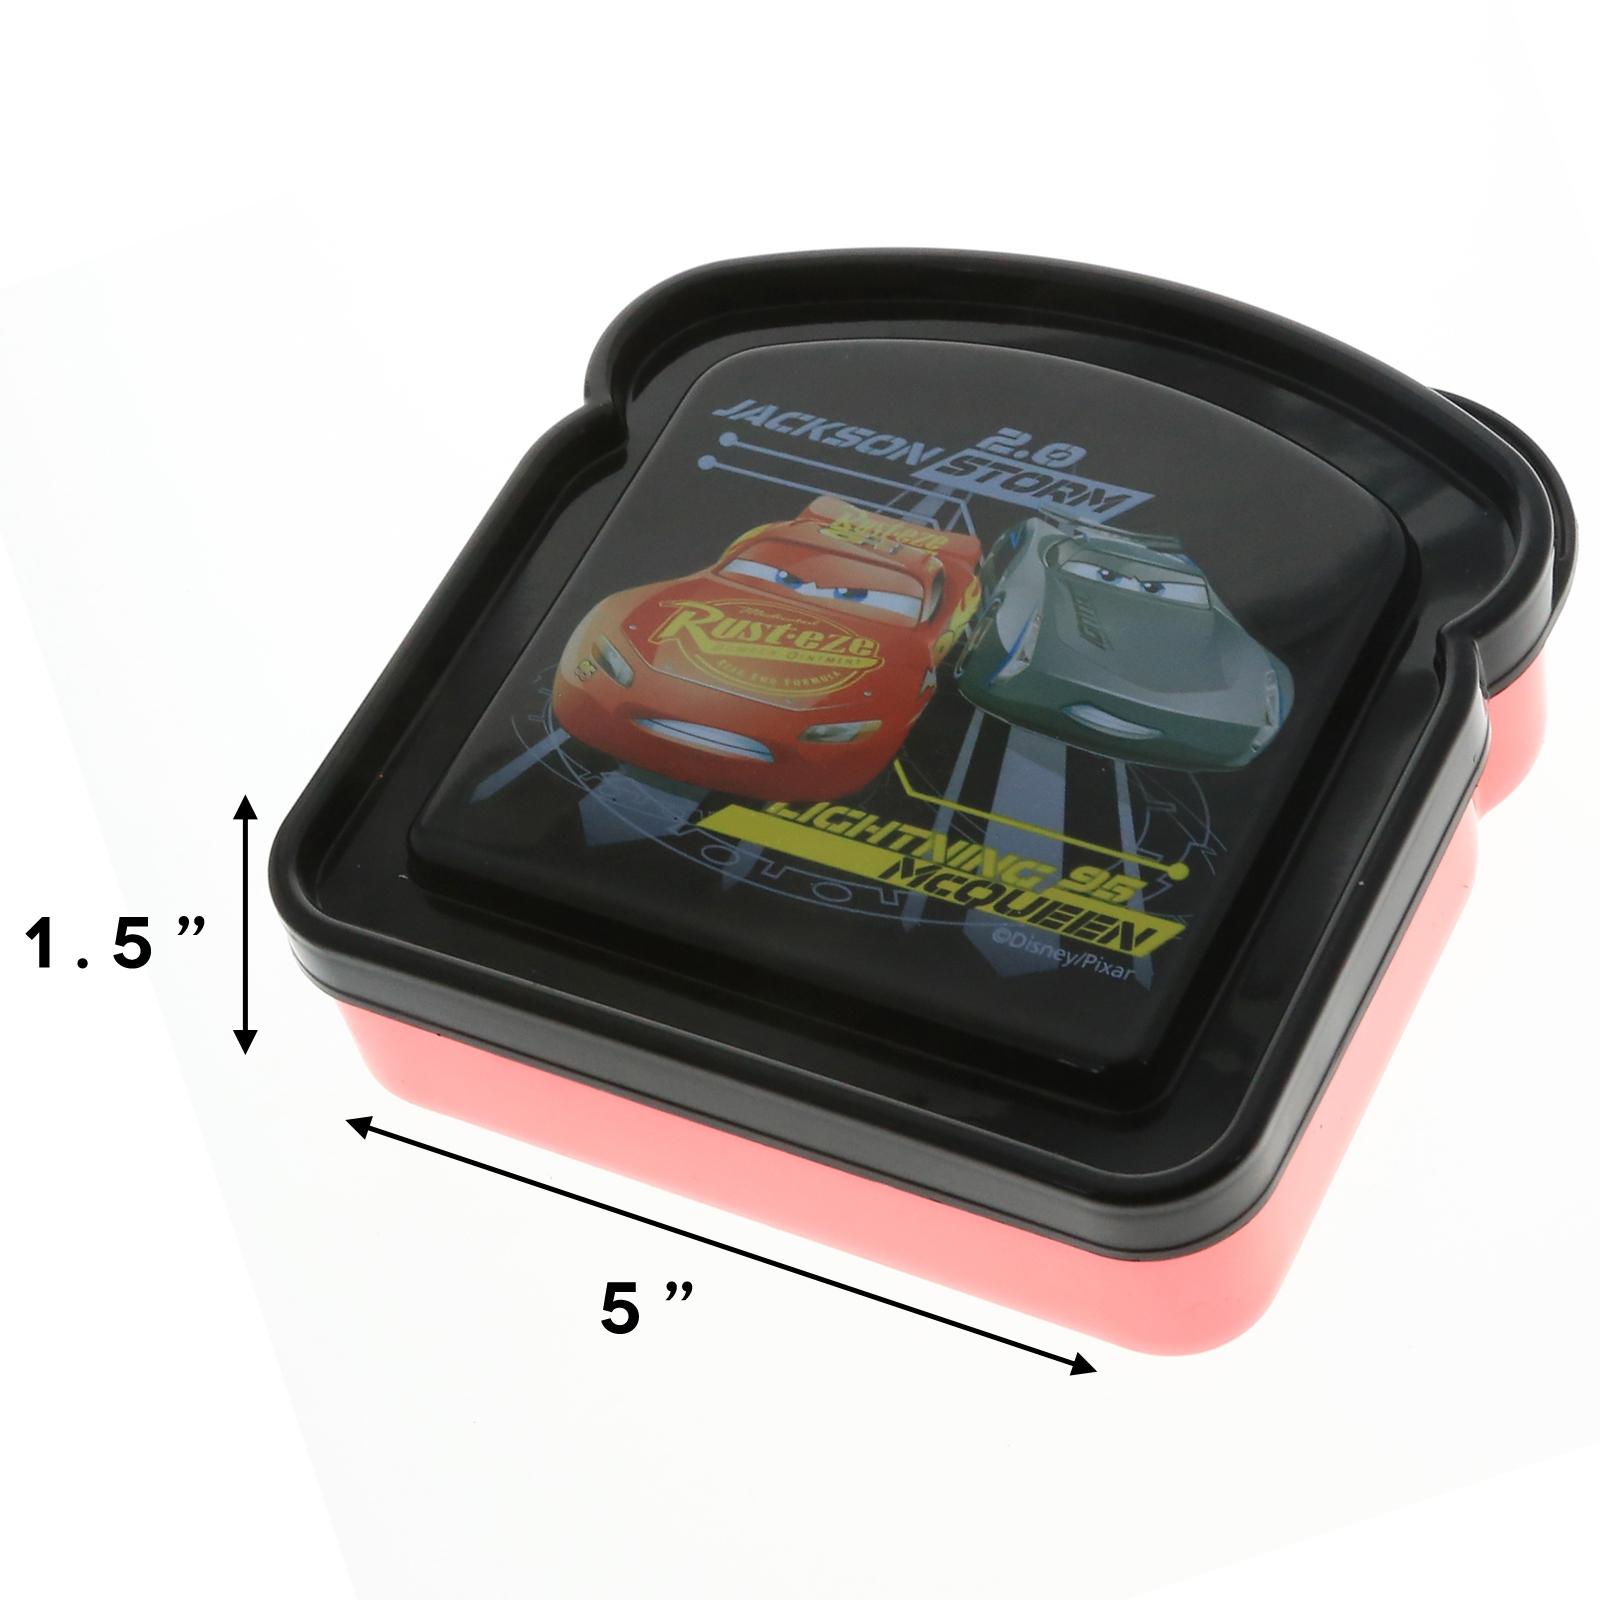 Disney Pixar Cars 3 Boys Sandwich Container Bread Lunch Box for School Travel